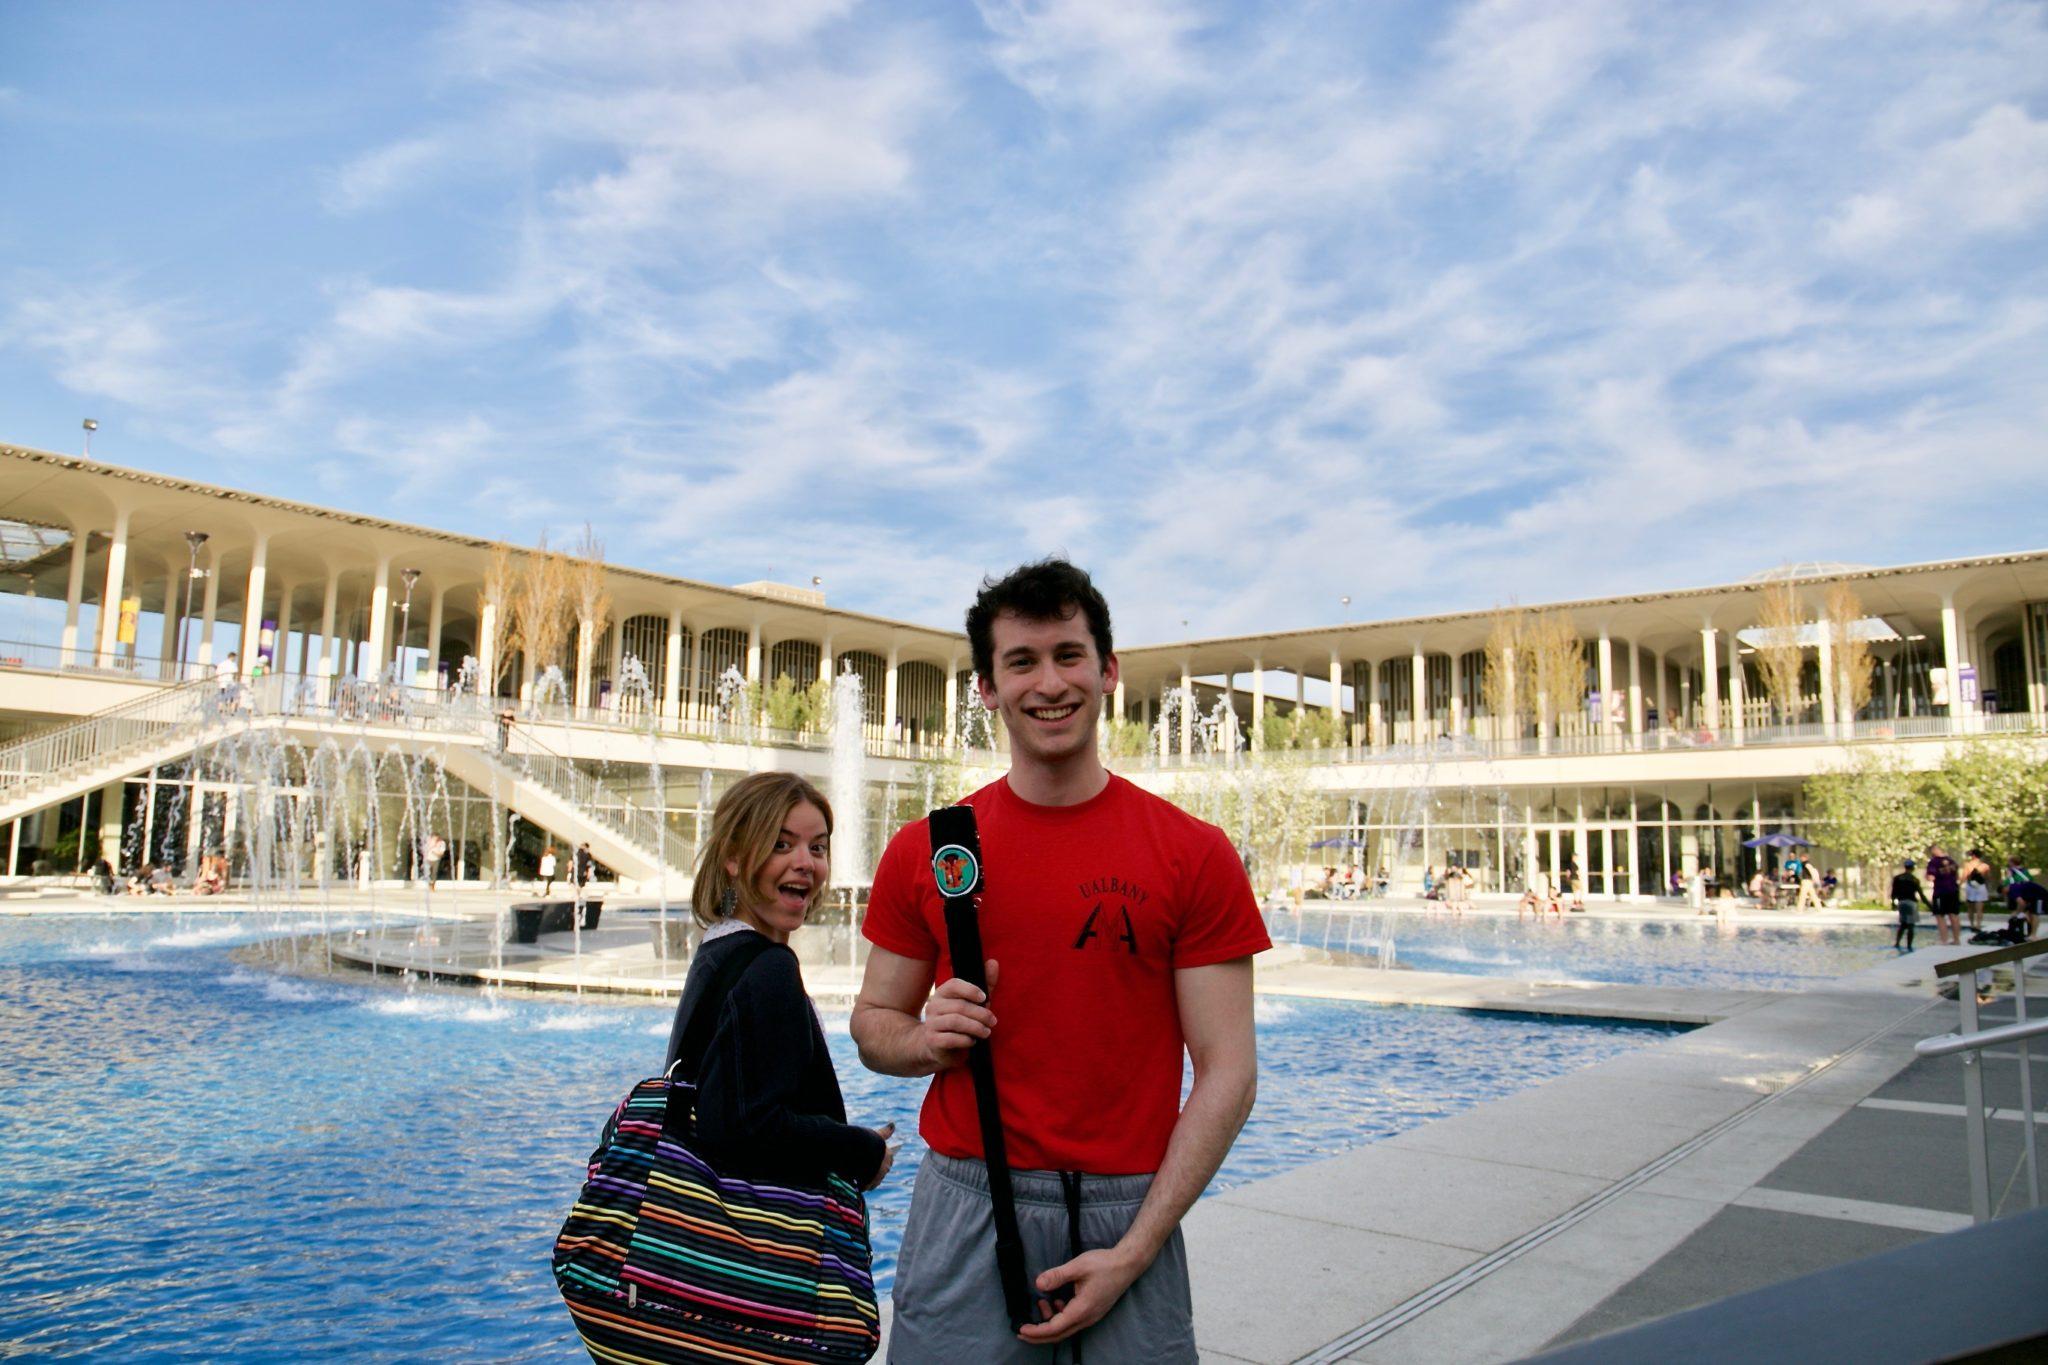 Mumpademic 2017 On The UAlbany Campus